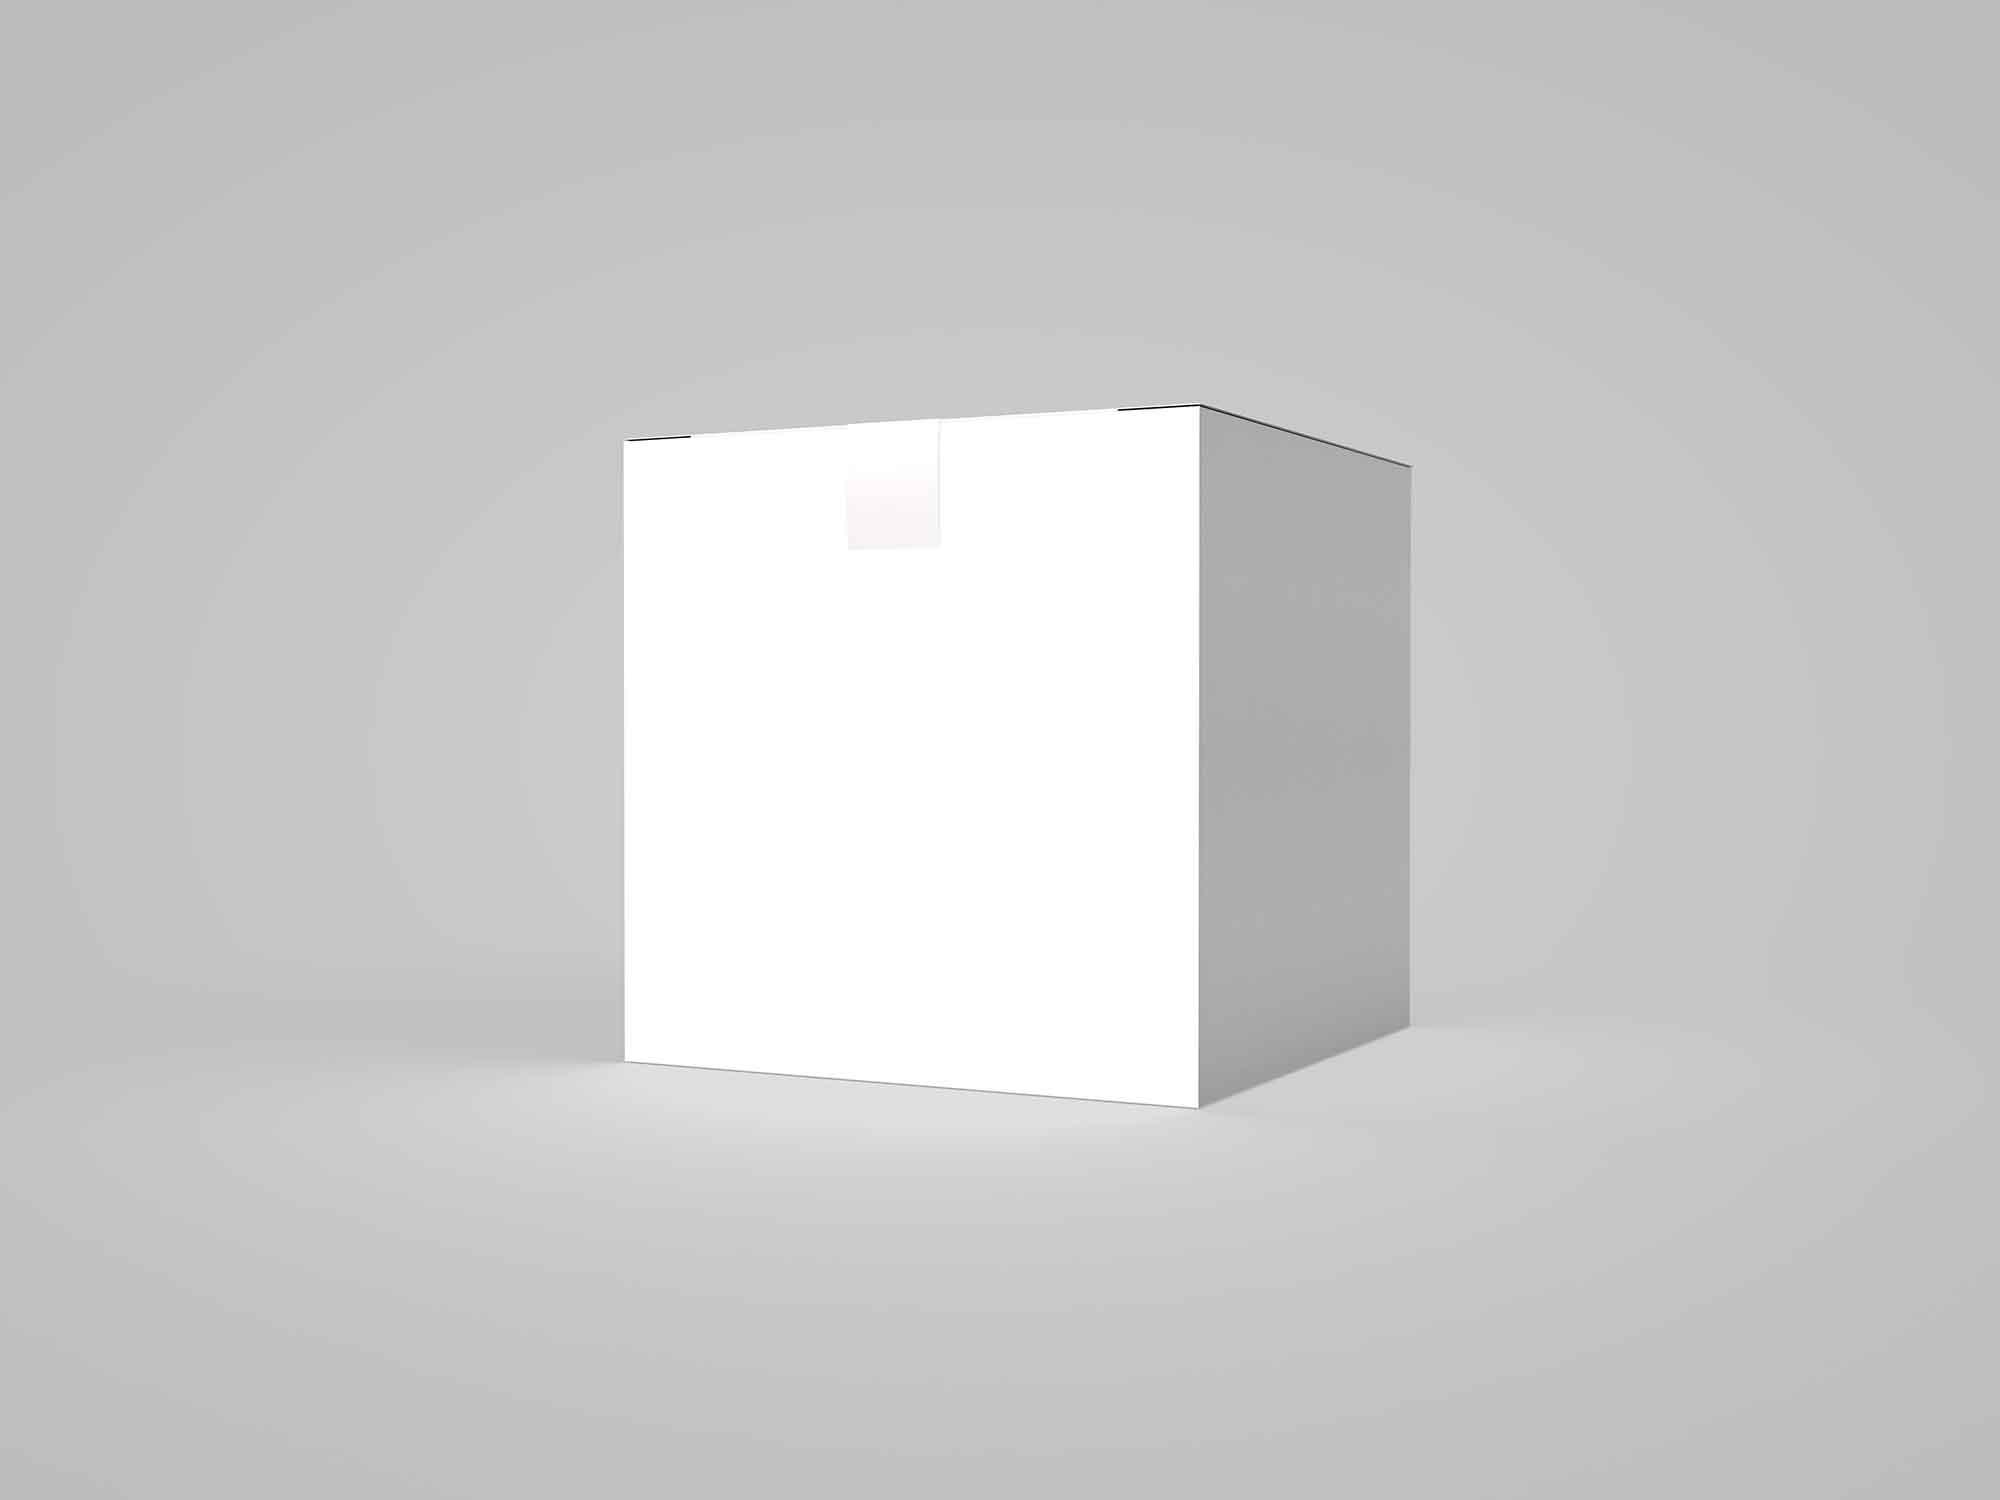 Square Paper Box Mockup 2